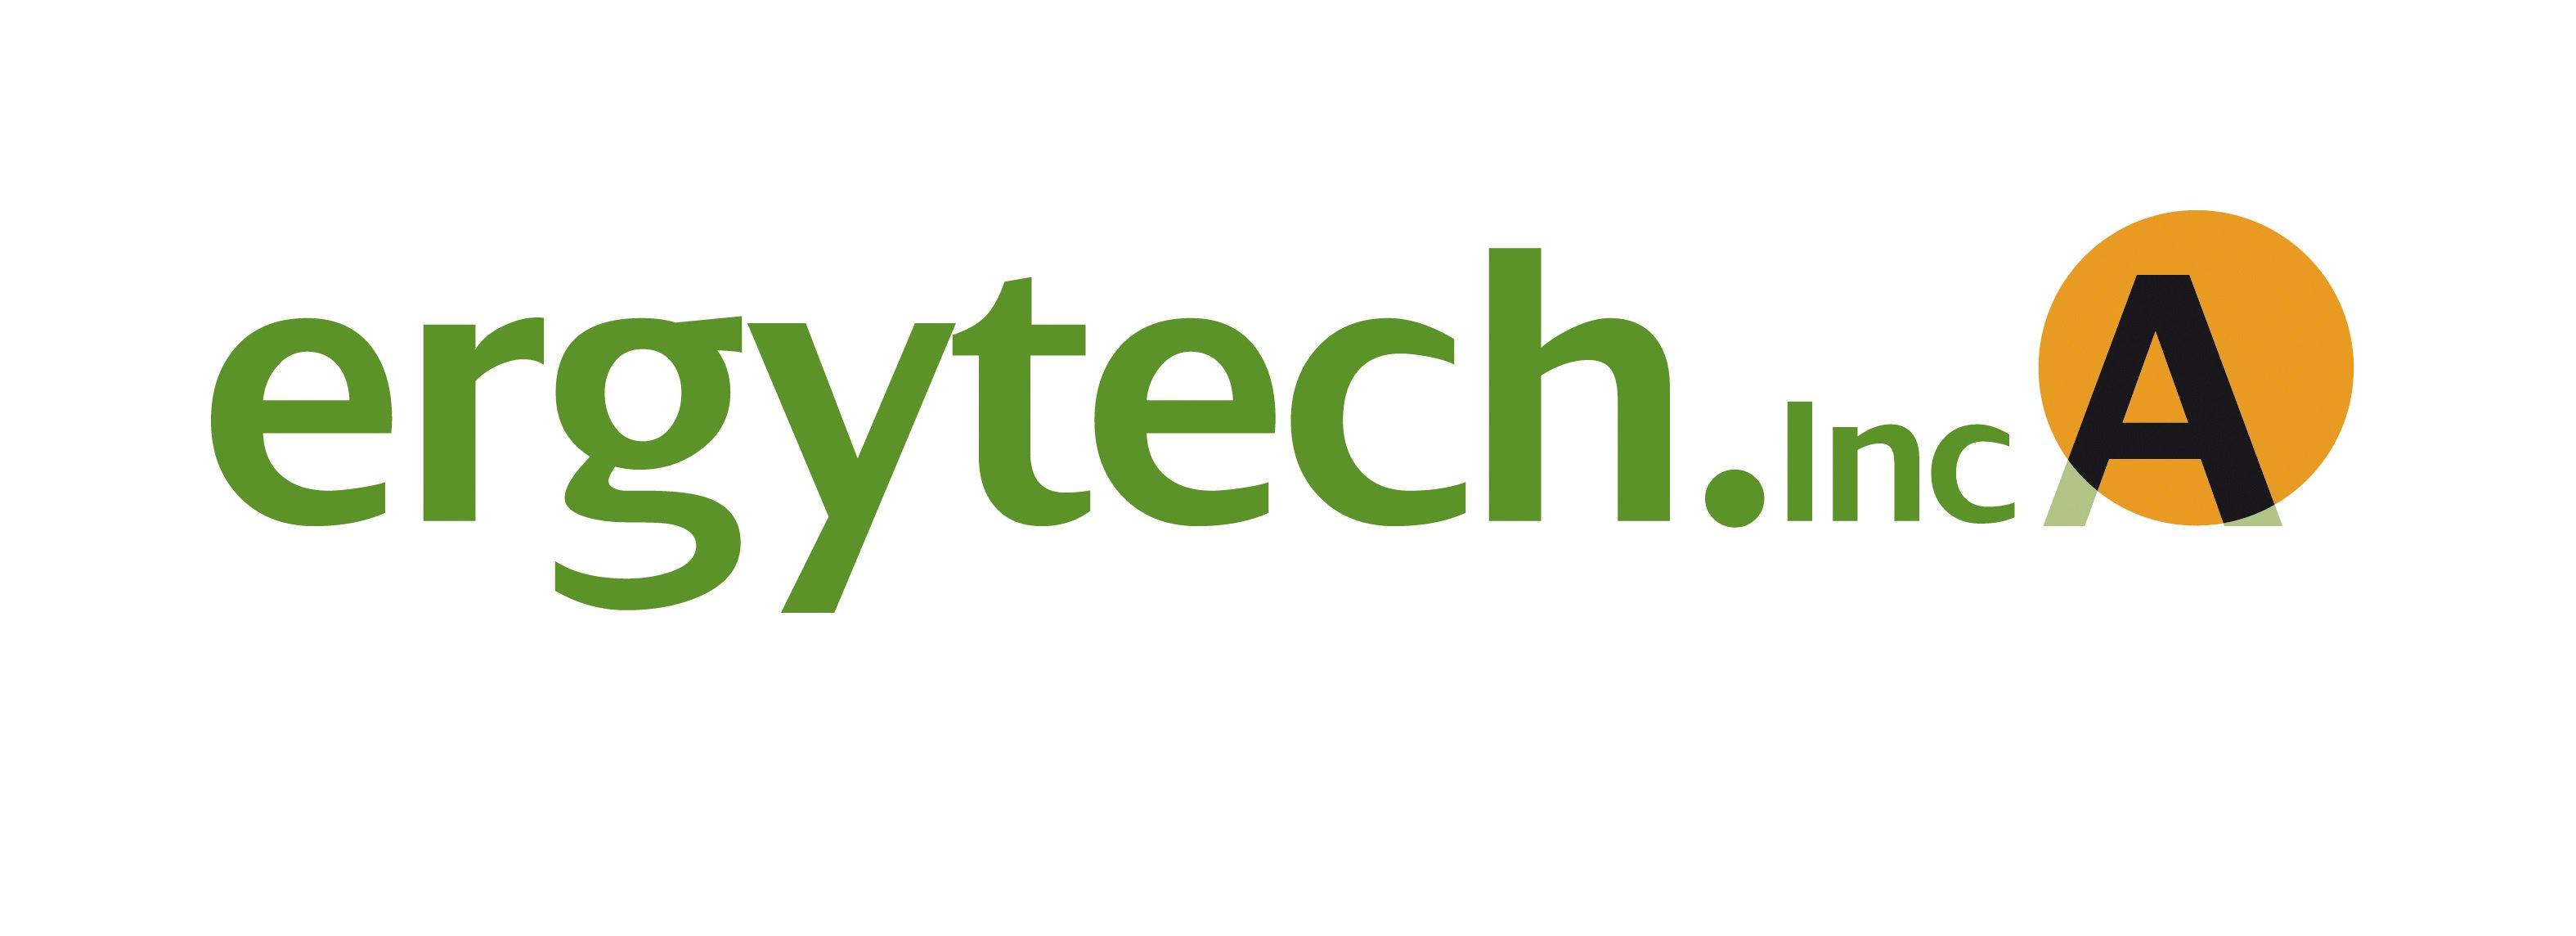 Ergytech, Inc